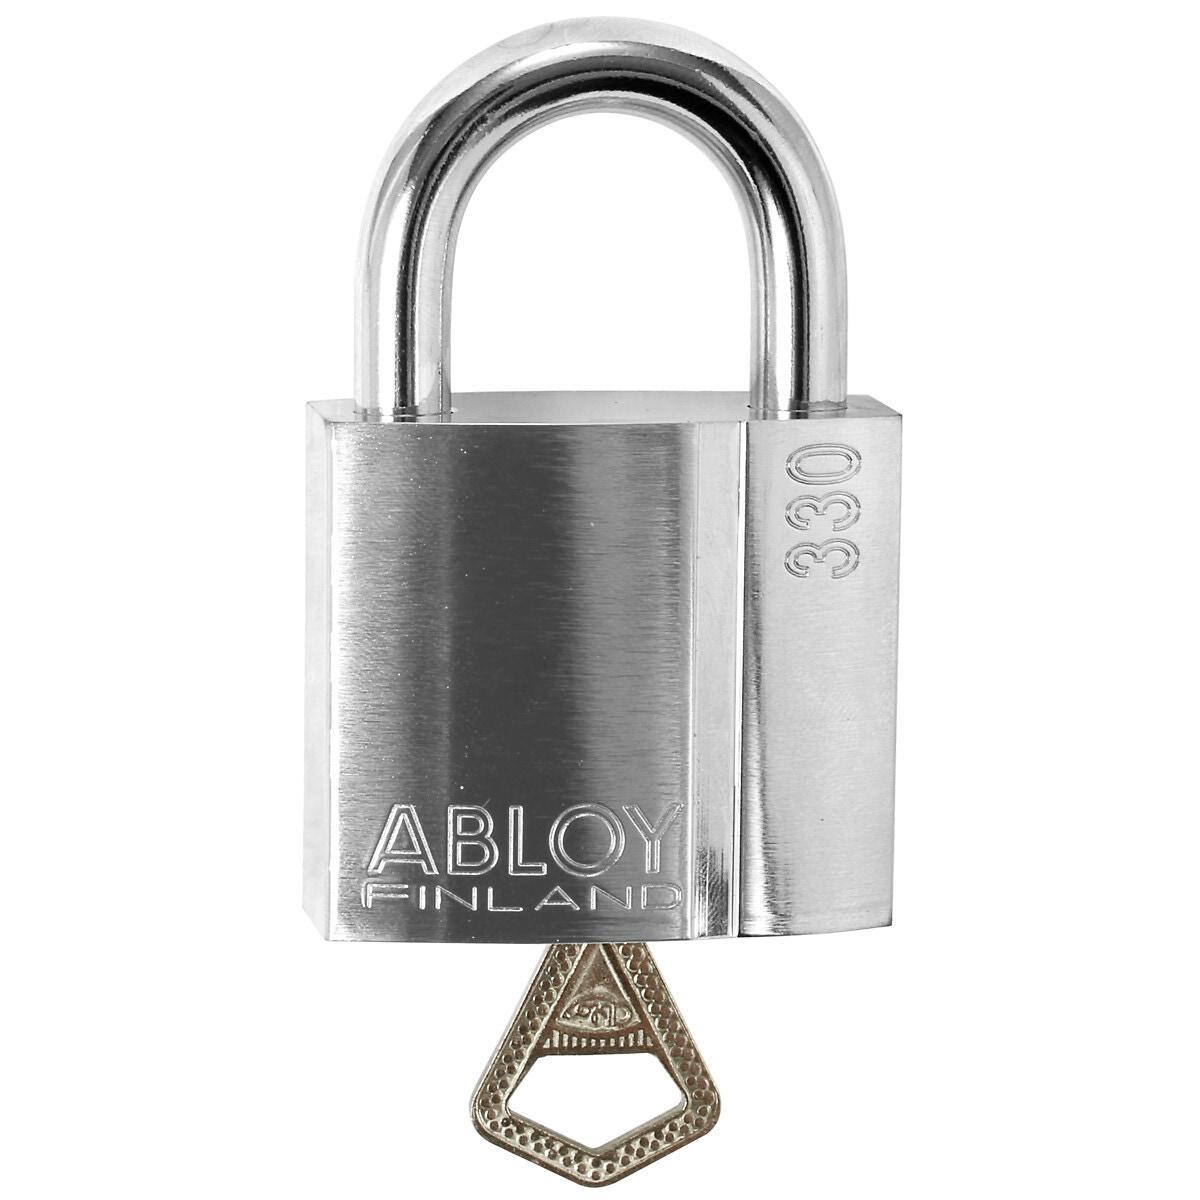 padlock 25mm abloy classic 330 he3300 ikh